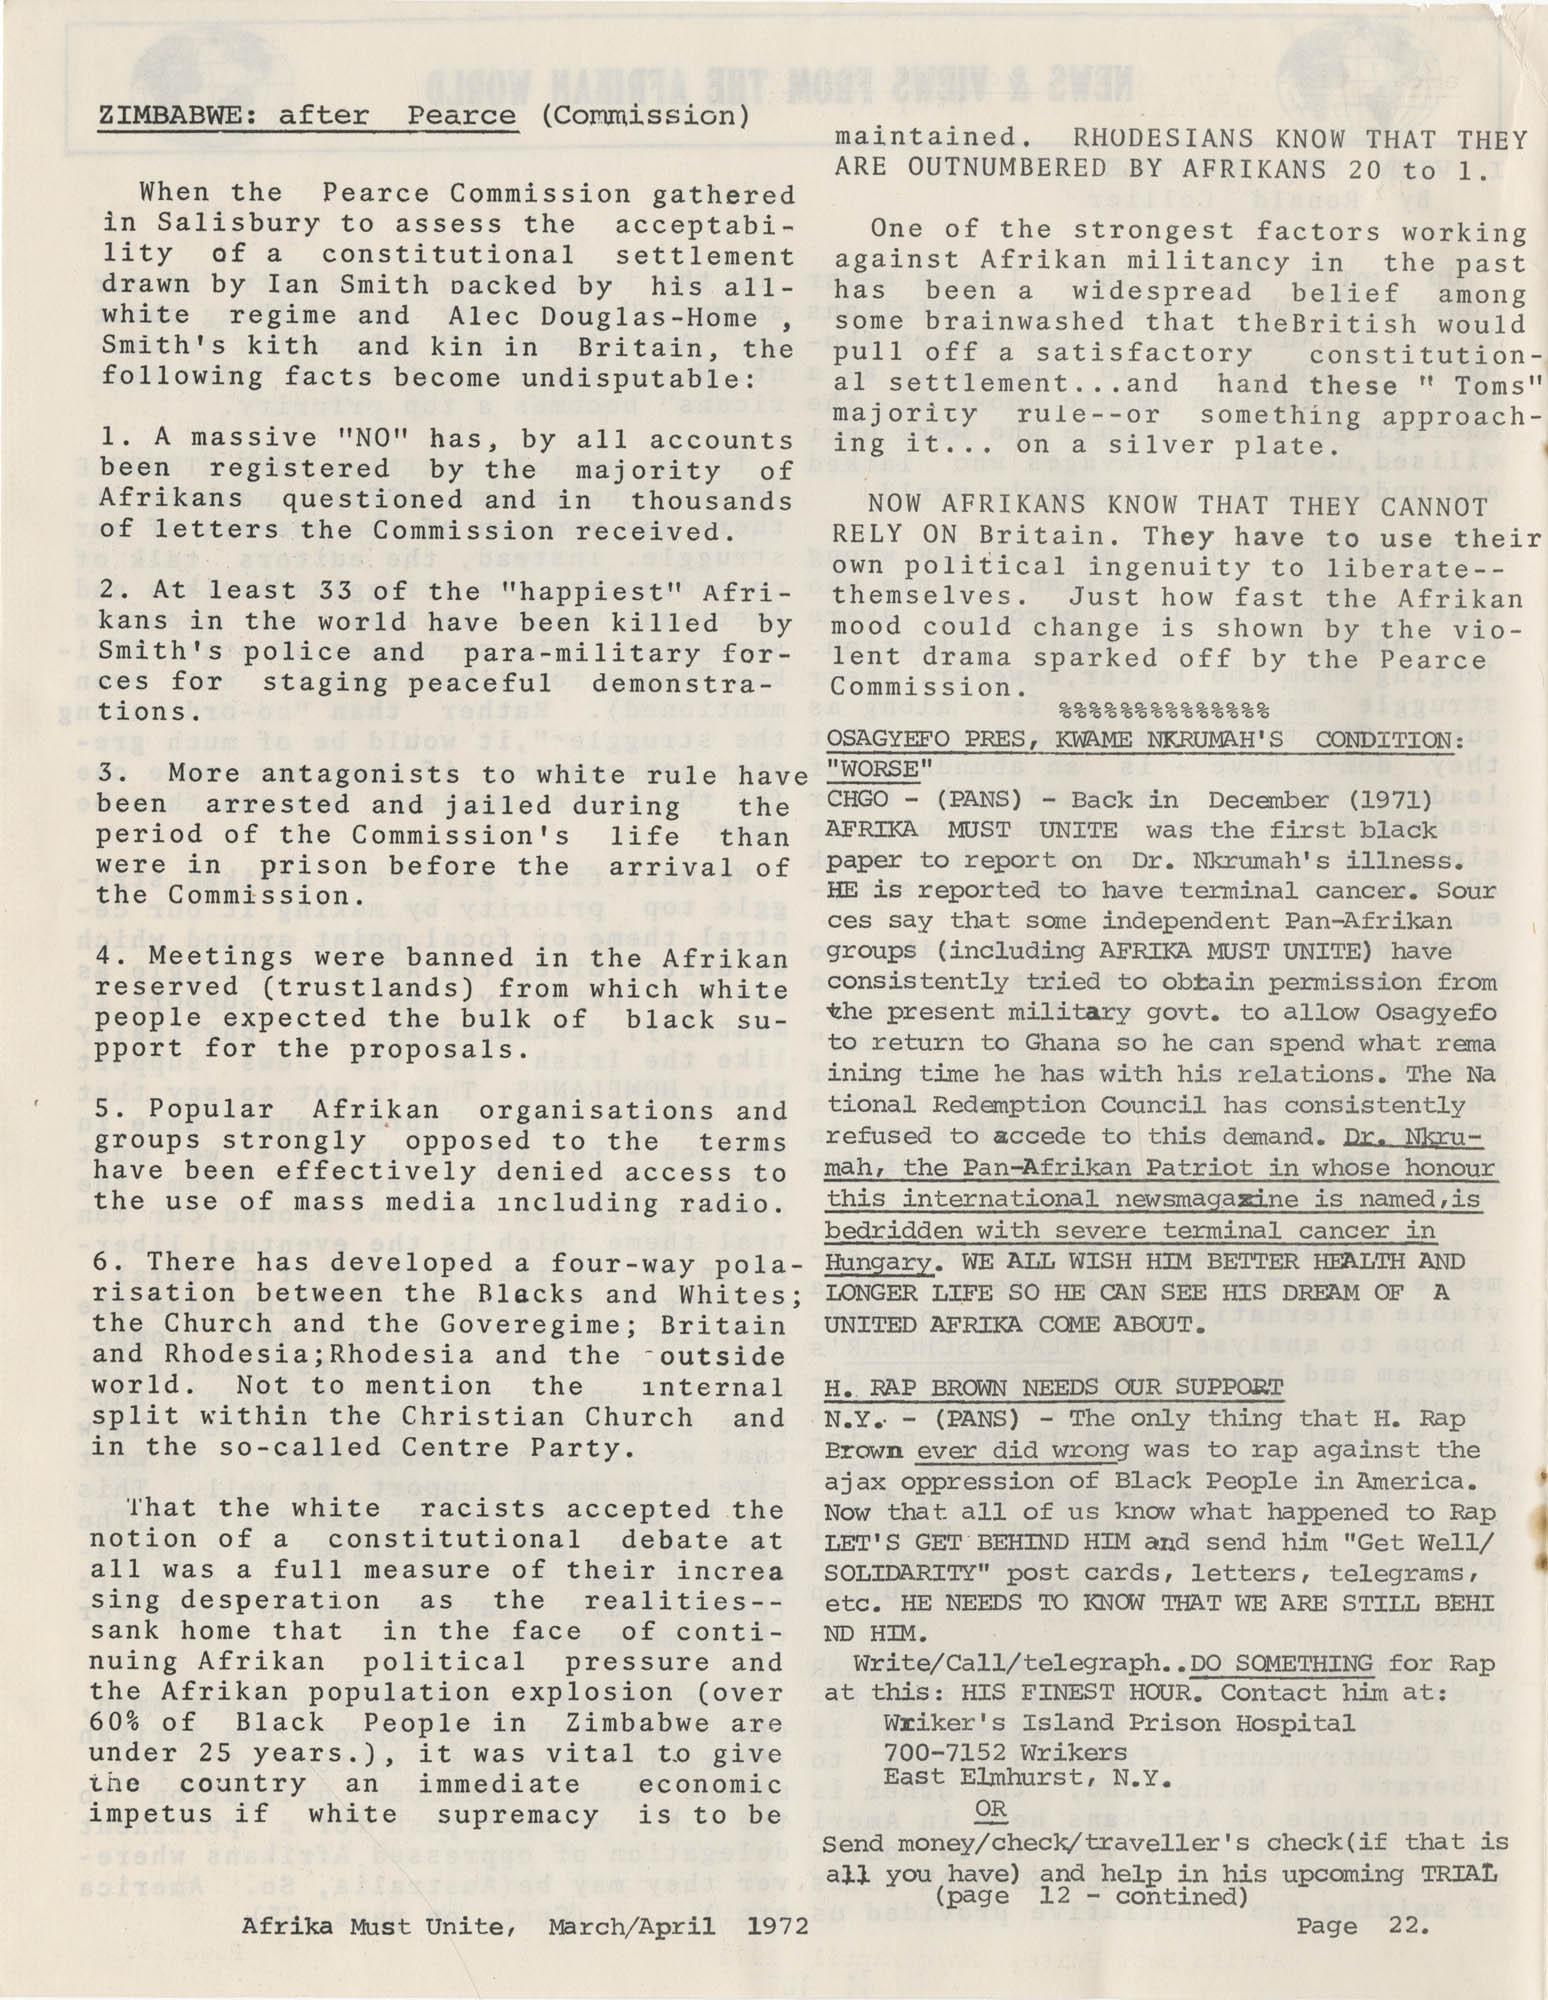 Afrika Must Unite, Vol. 1, No. 4, Page 22